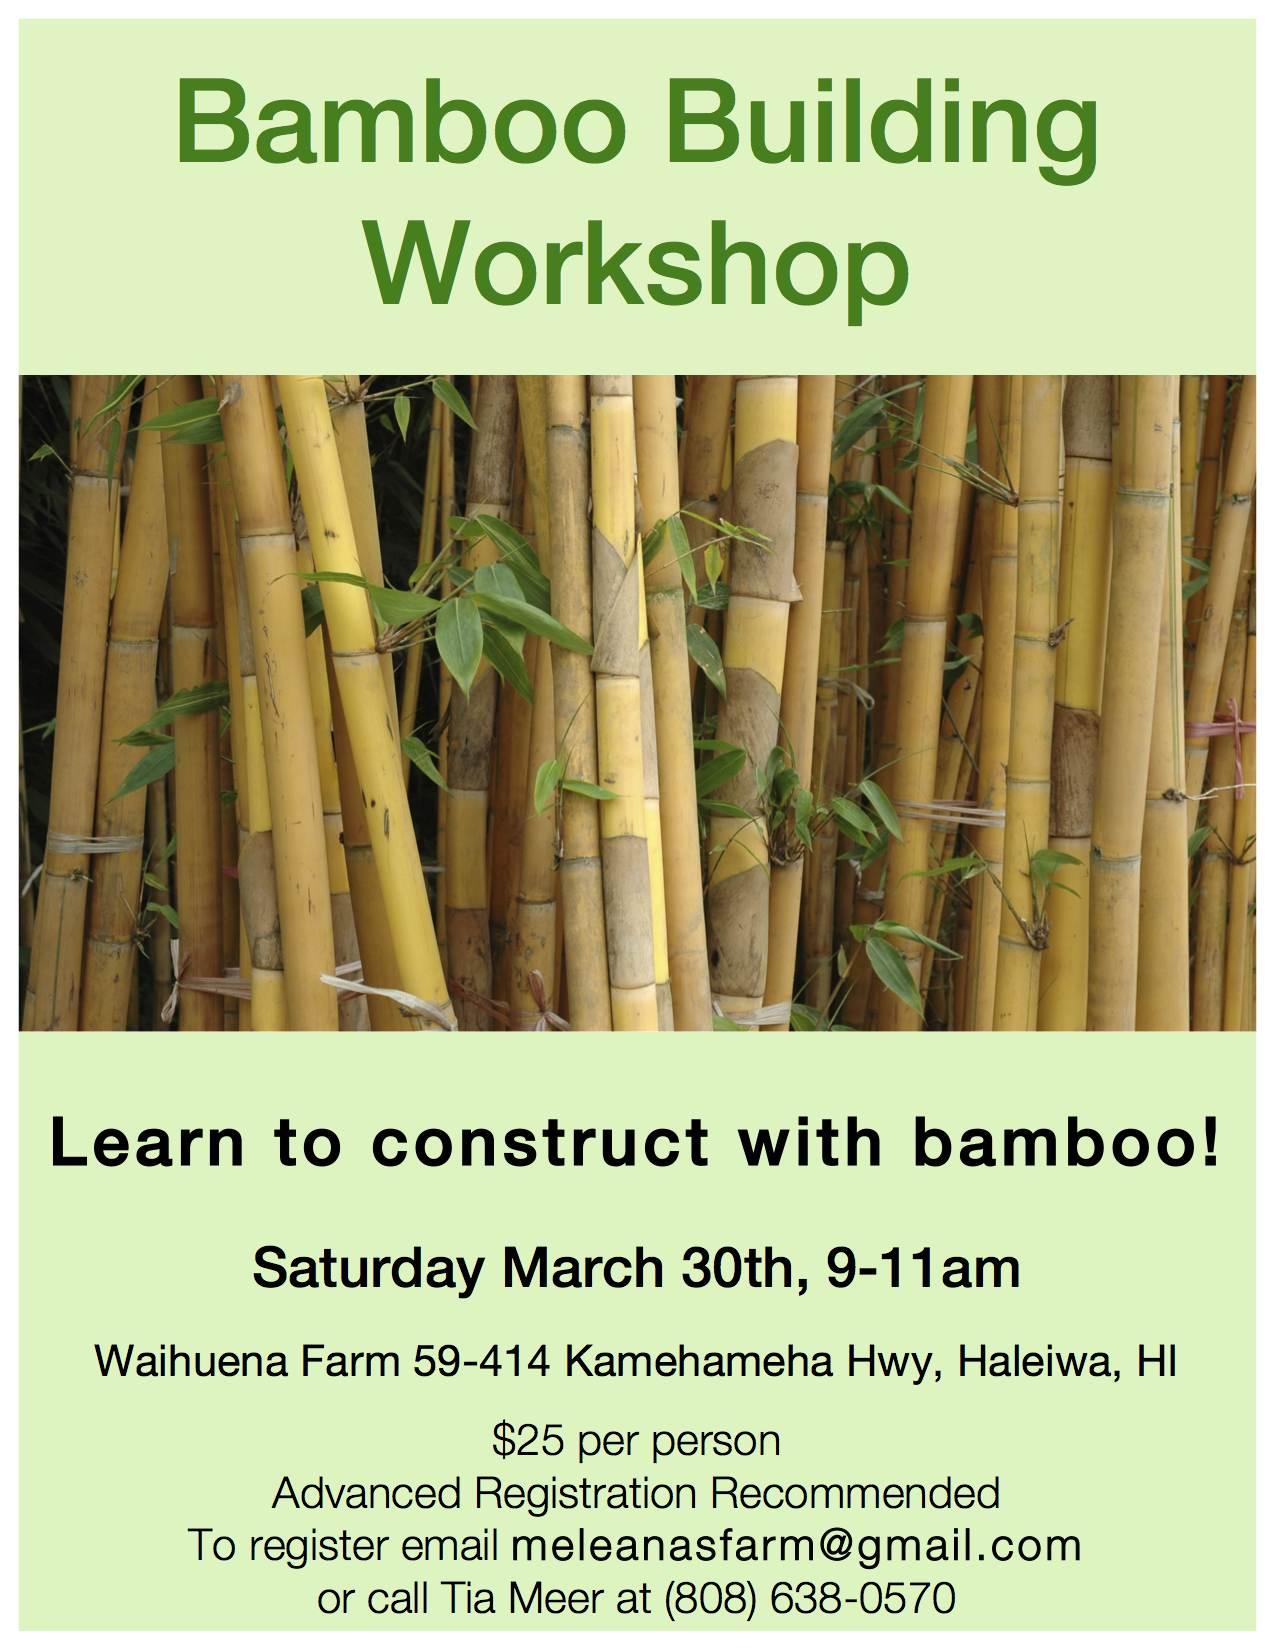 Bamboo Workshop flyer